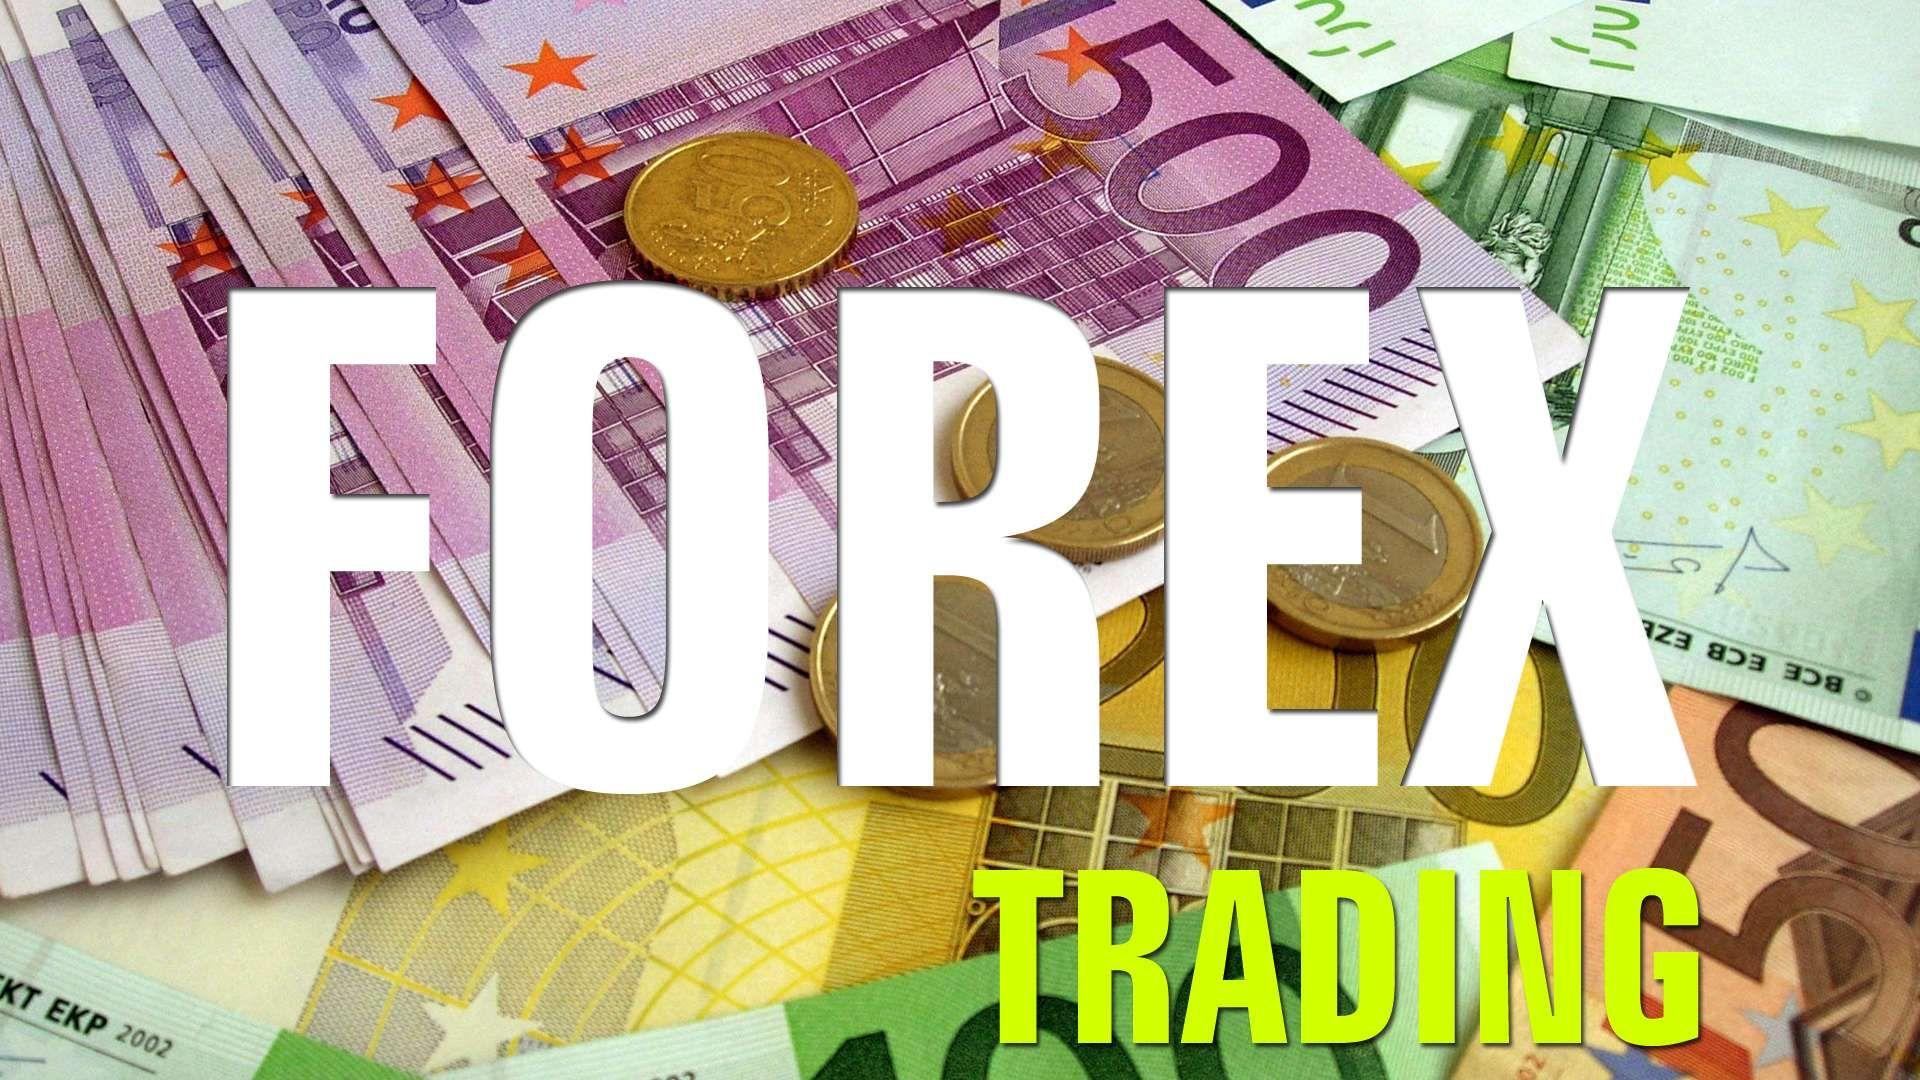 Can suggest Forex 2 percent rule, piyasalarda son durum not